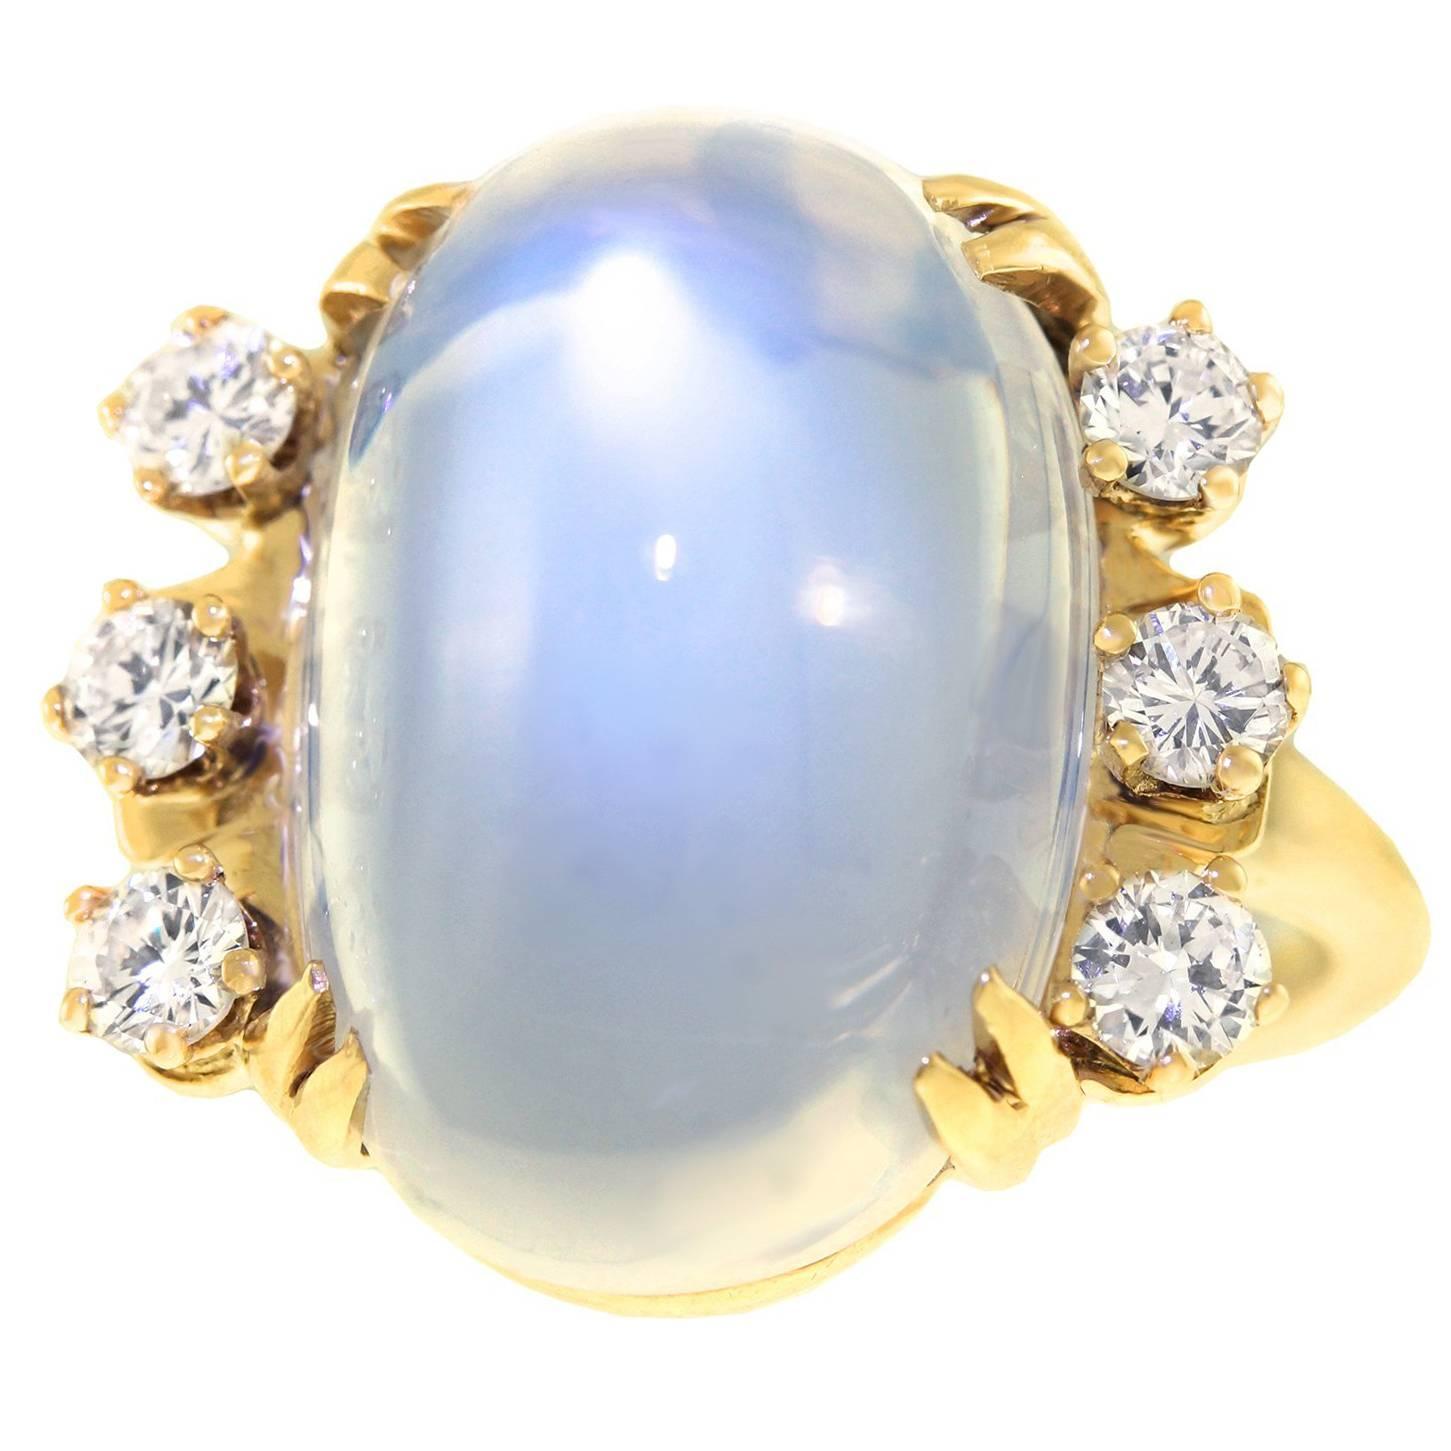 f u0026 f felger art deco gold ring set with carat moonstone